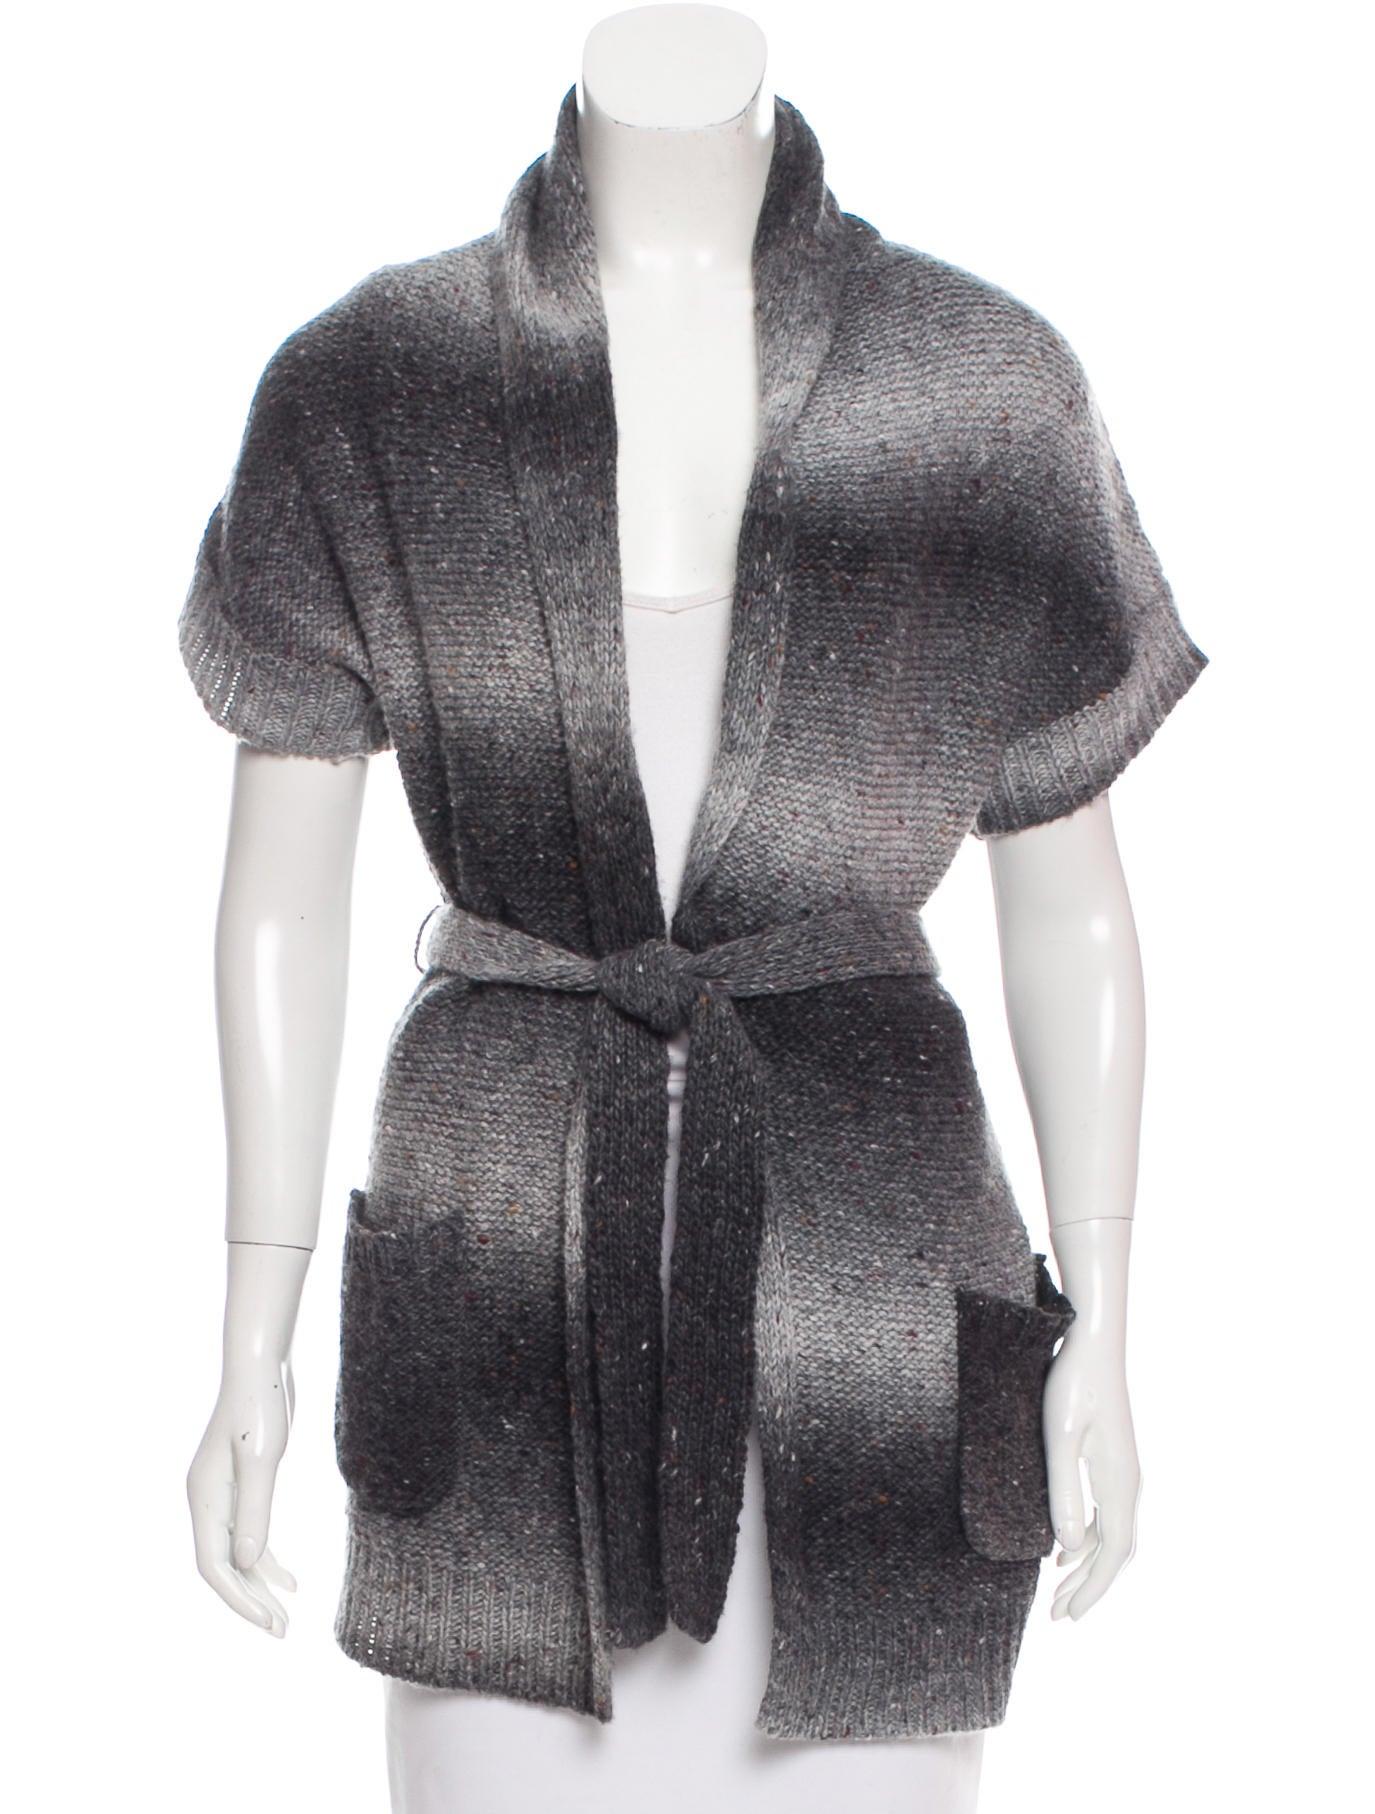 Tibi Short Sleeve Wrap Sweater - Clothing - WTI36300   The RealReal